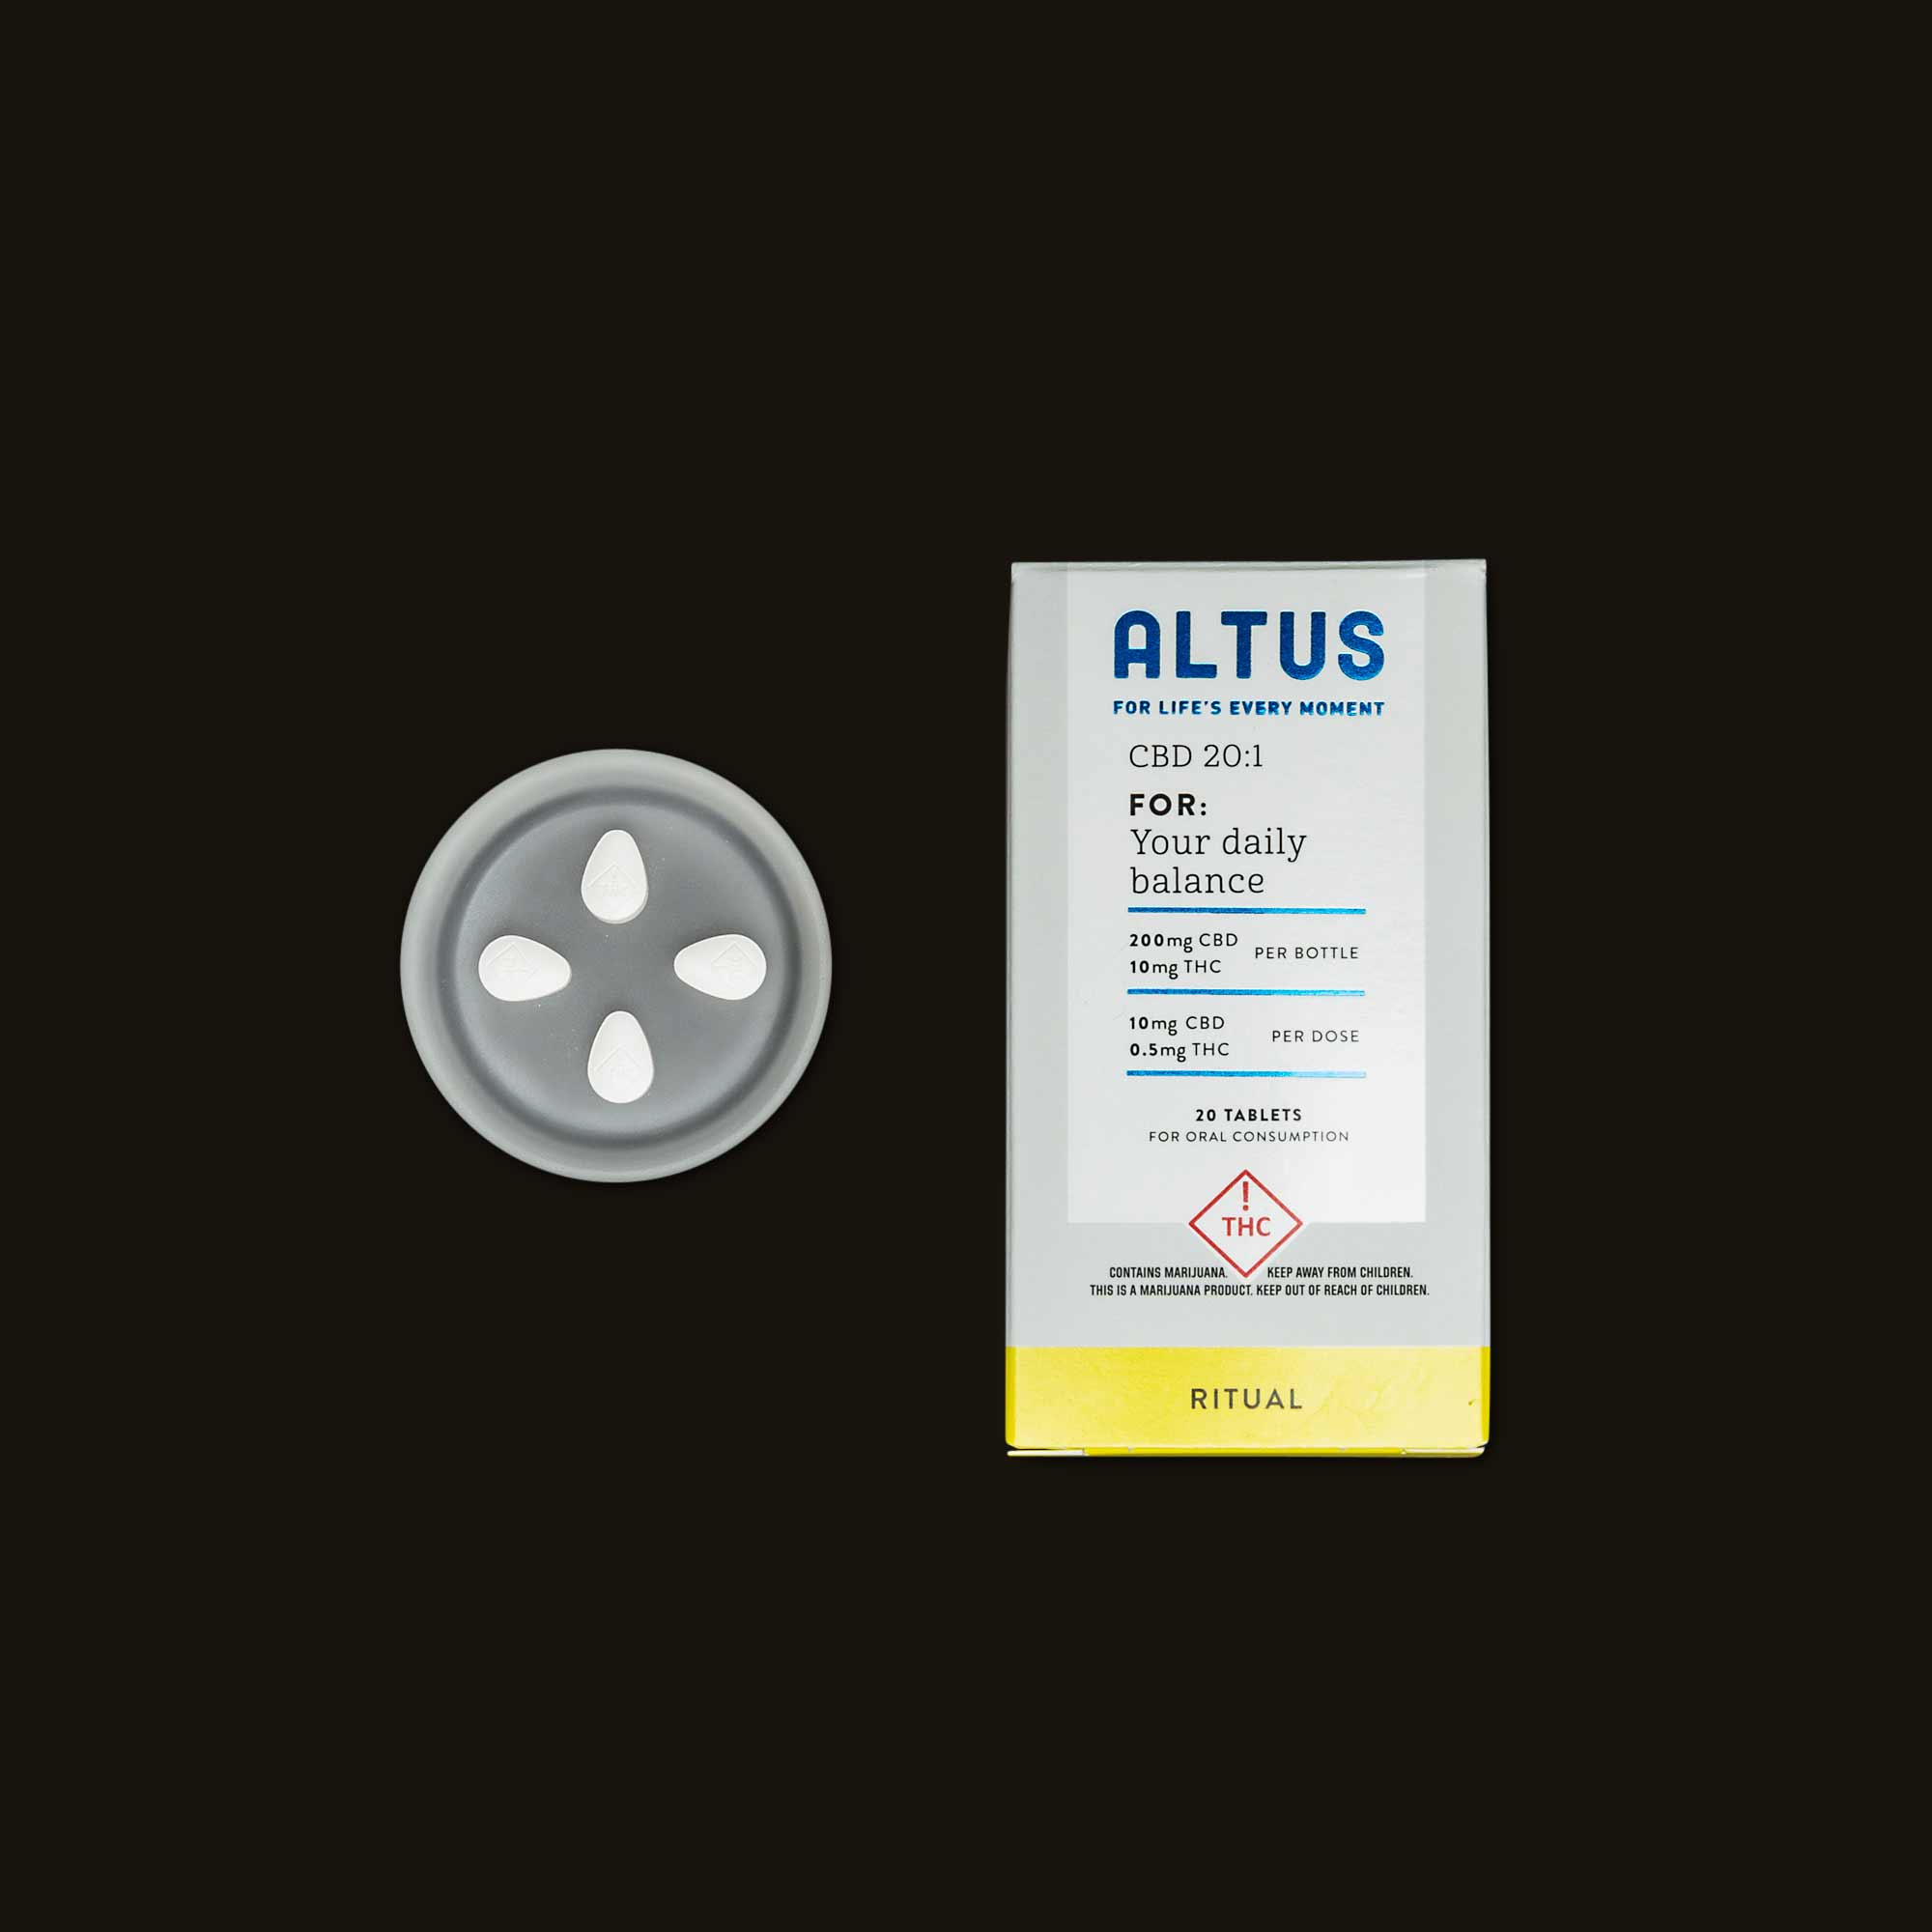 Altus Made Ritual 20:1 CBD:THC Tablets